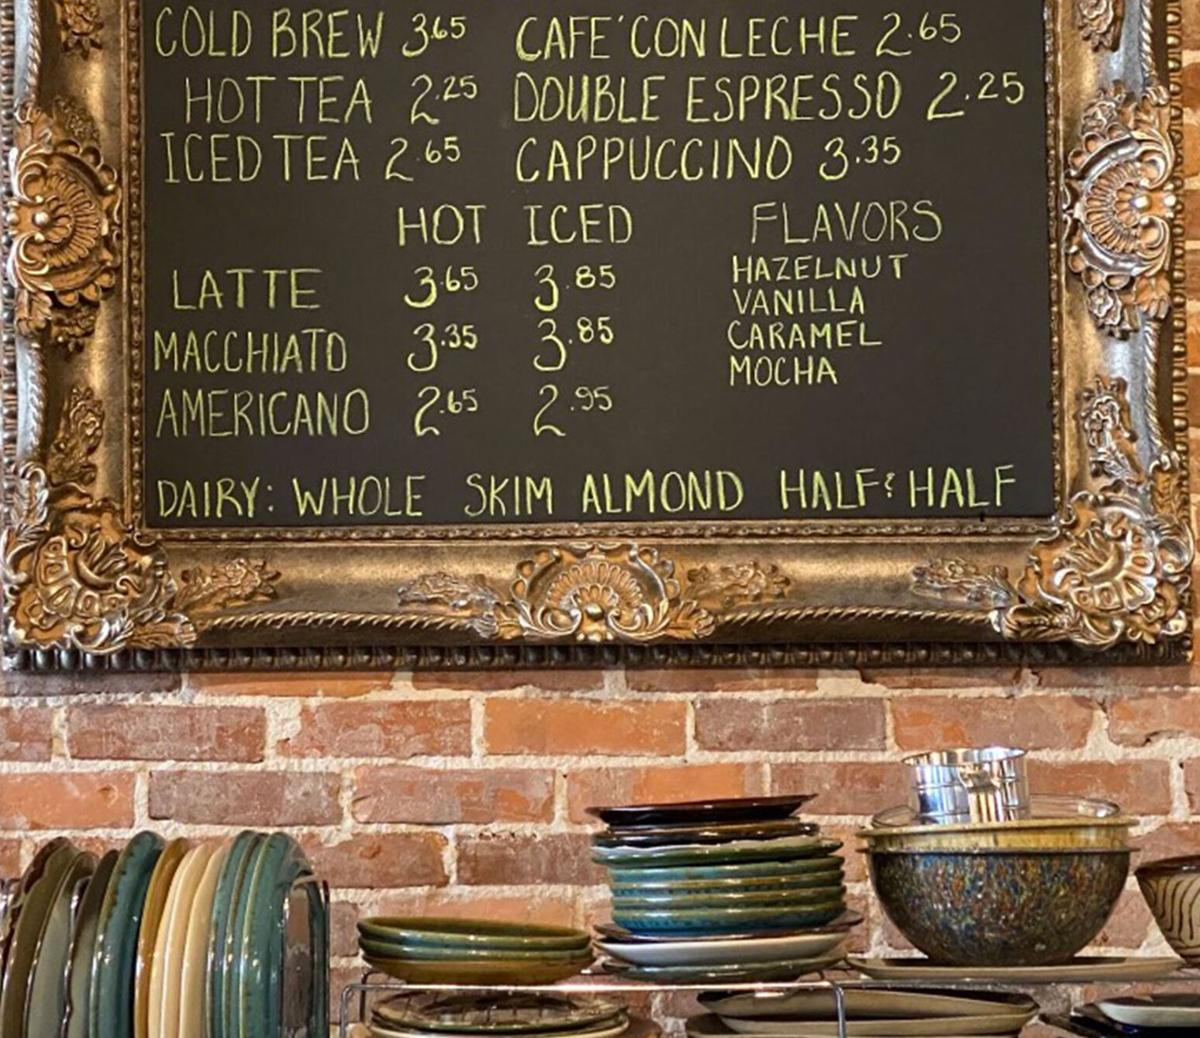 25-coffee-shop.jpg